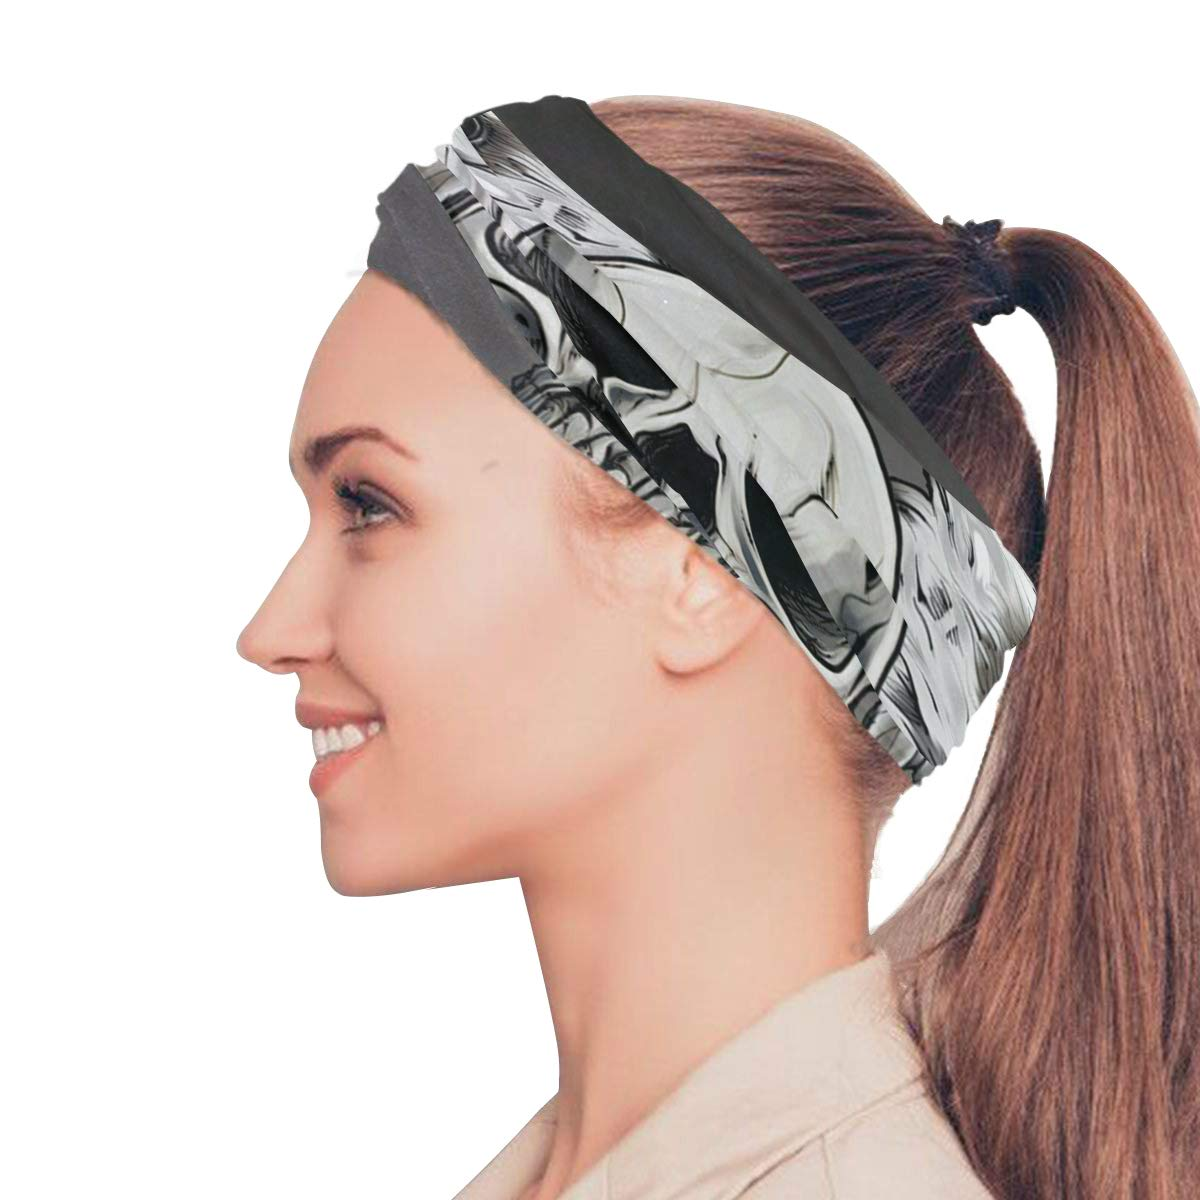 Magic Headwear Eagle Effect Outdoor Scarf Headbands Bandana Mask Neck Gaiter Head Wrap Mask Sweatband